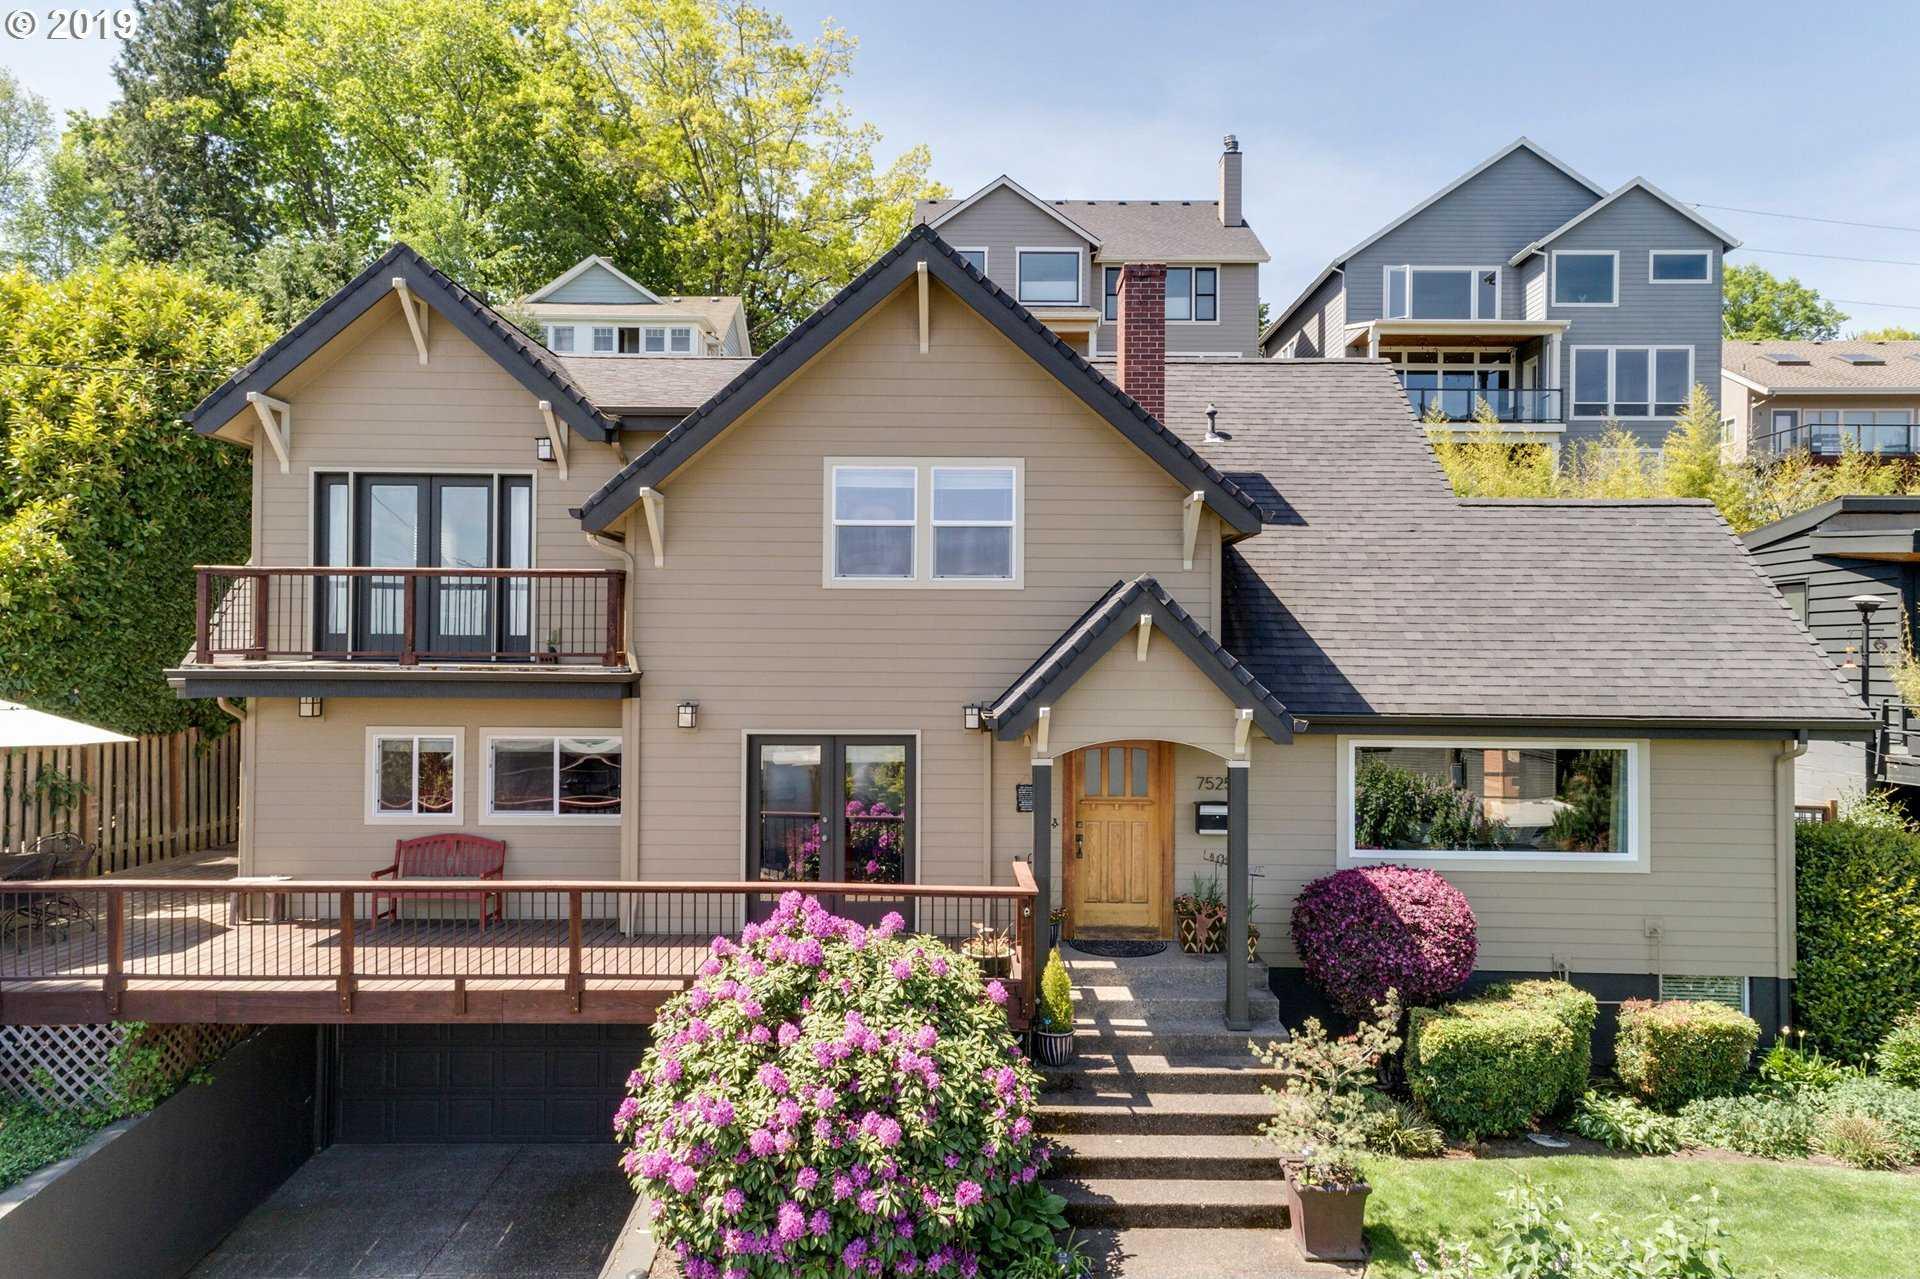 $899,900 - 5Br/4Ba -  for Sale in Fulton Park, Portland